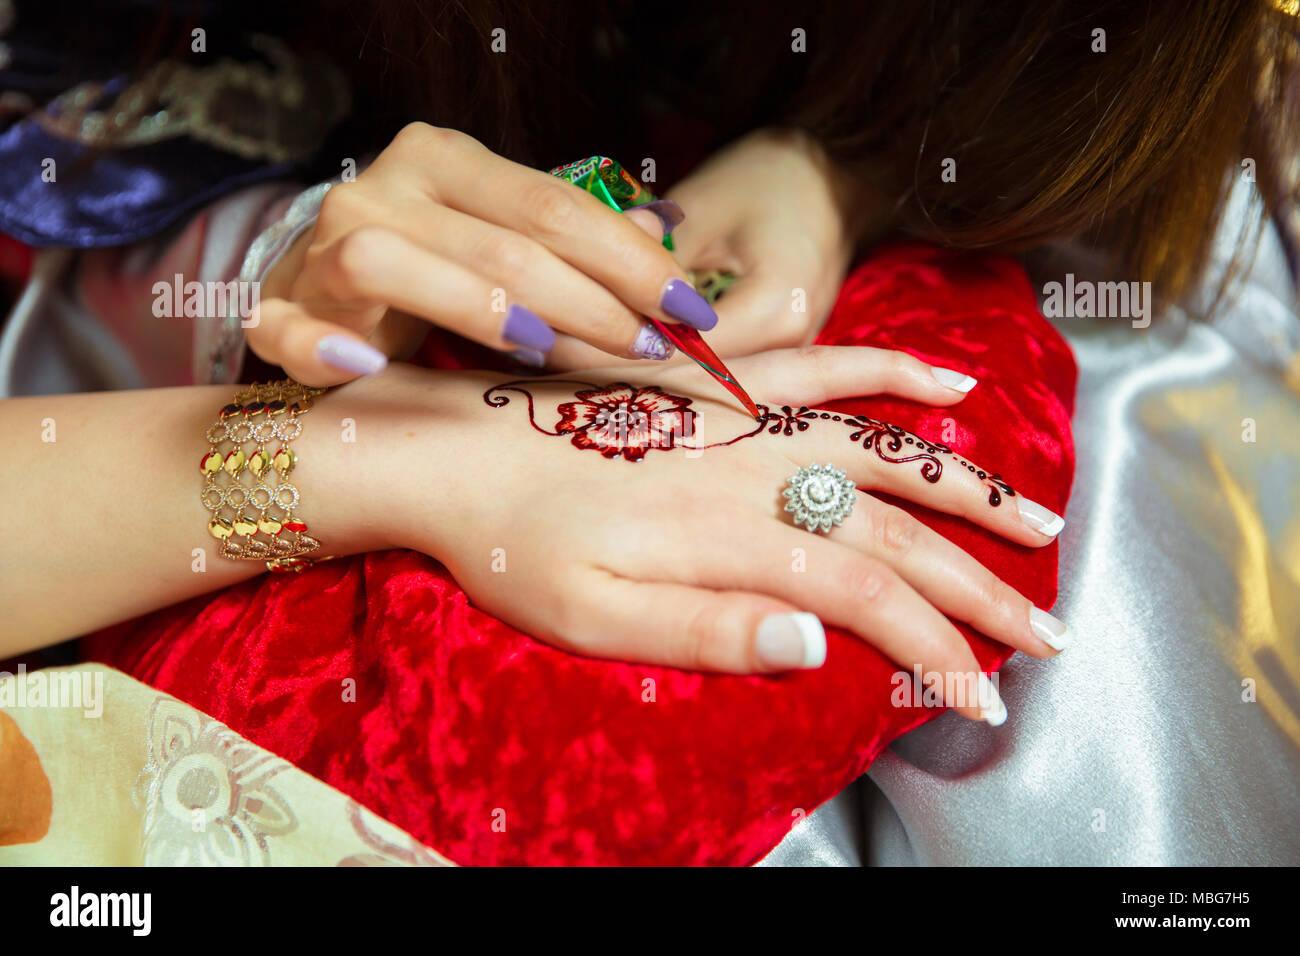 Henna Design Tattoo Women Applying Flowers Henna Tattoo On Women